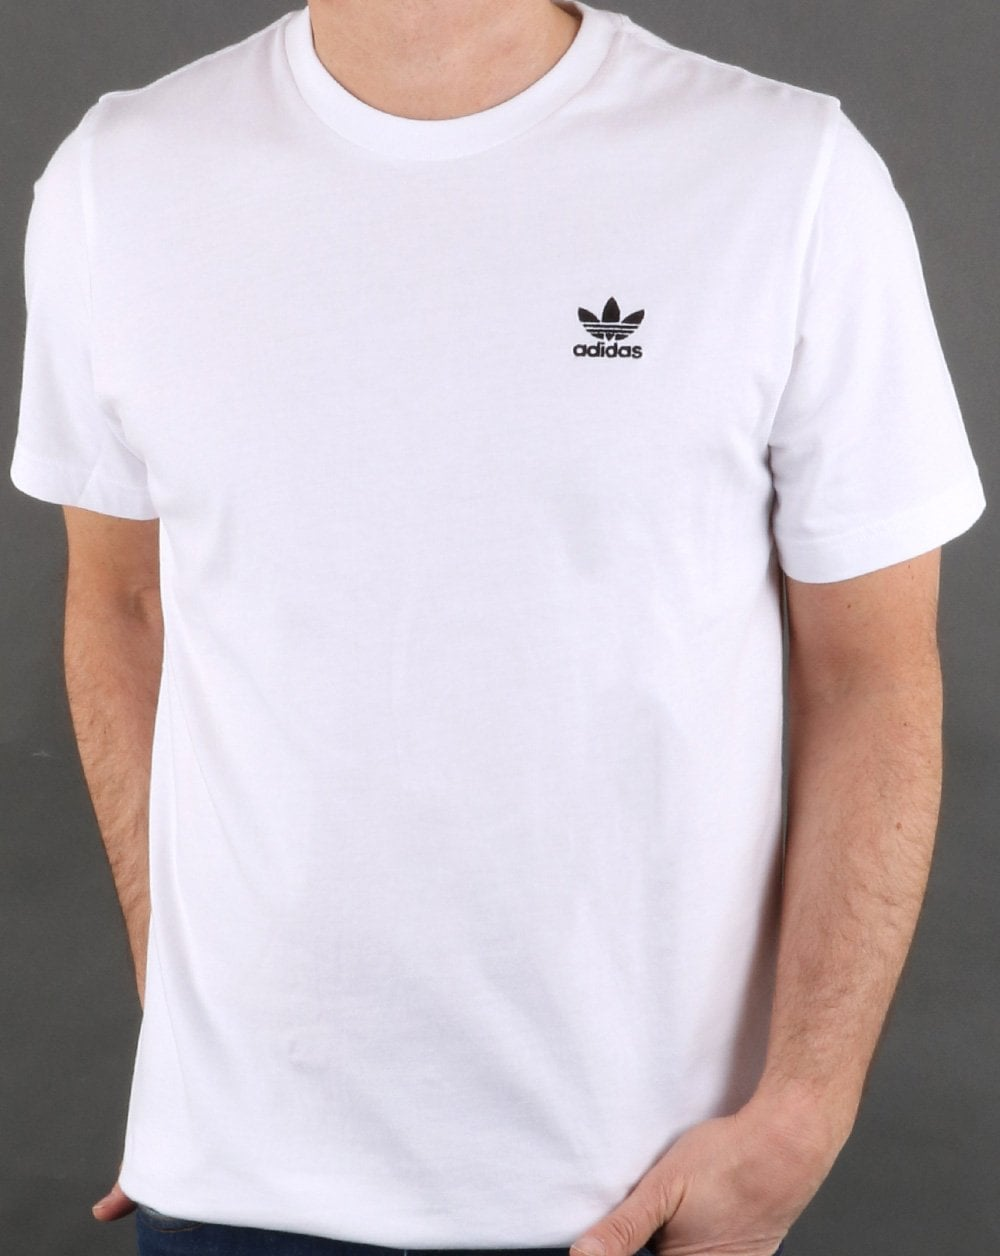 adidas original t-shirt weiß